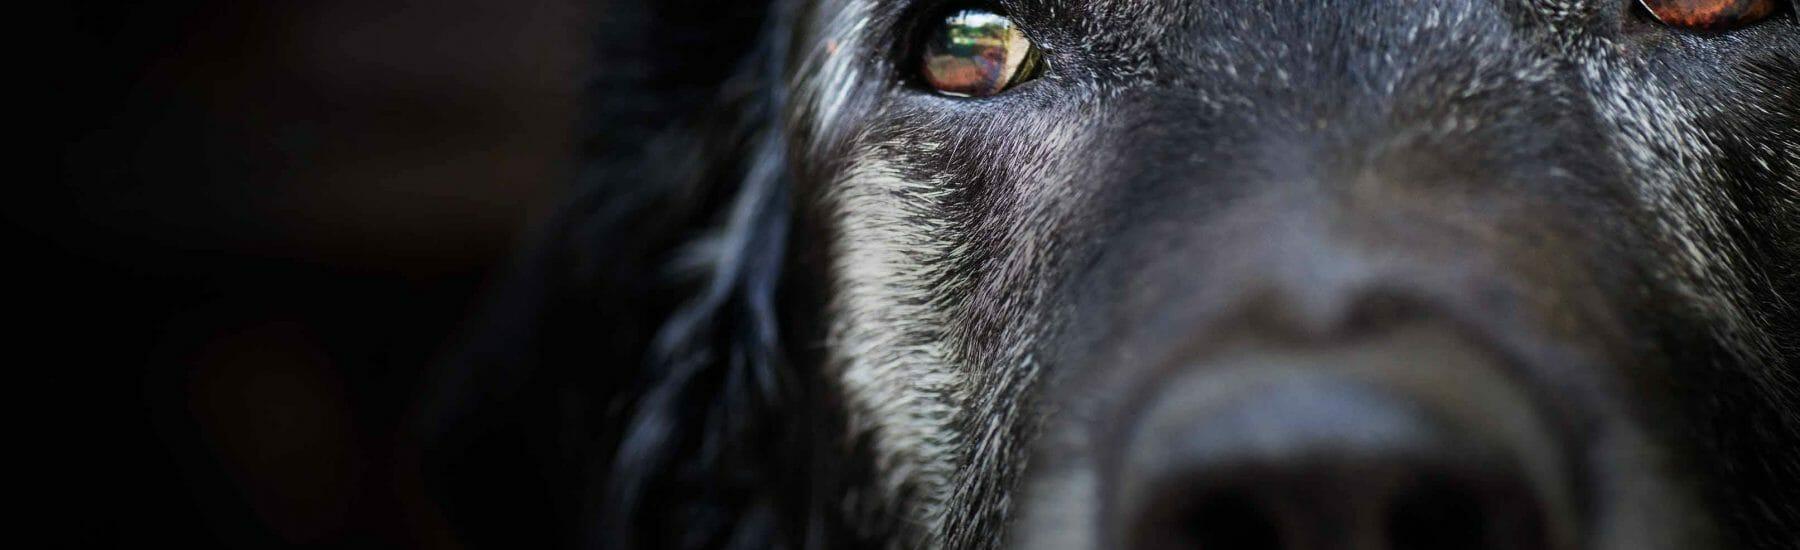 Close up of sad looking lab dog